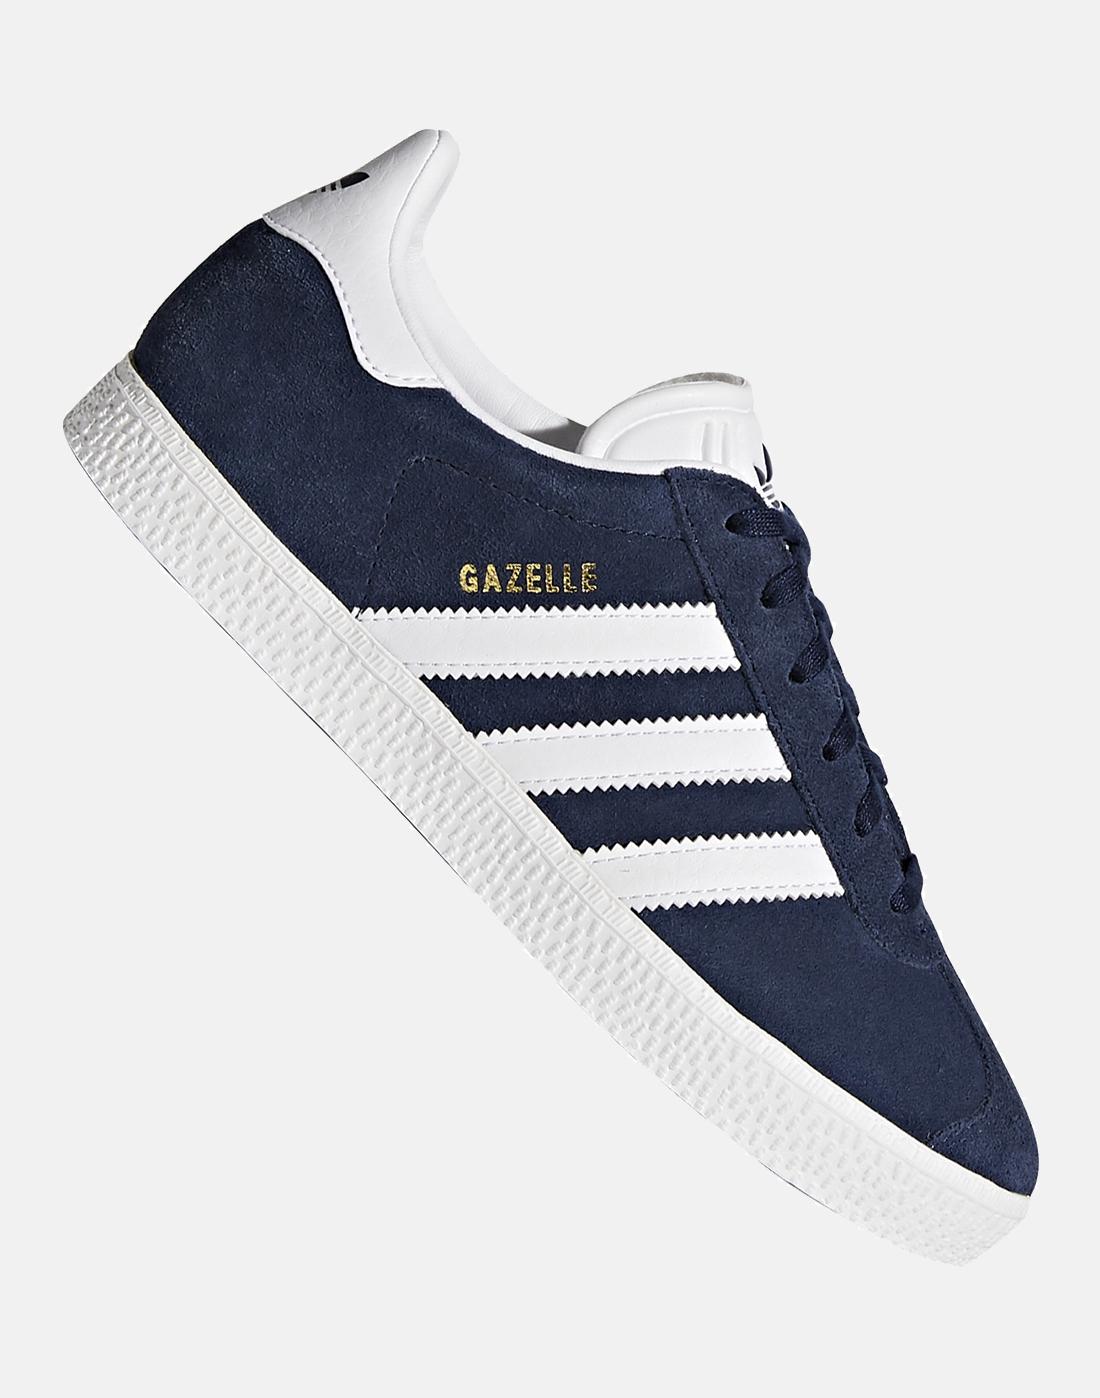 67b505b3 adidas Originals. Older Kids Gazelle. Older Kids Gazelle ...